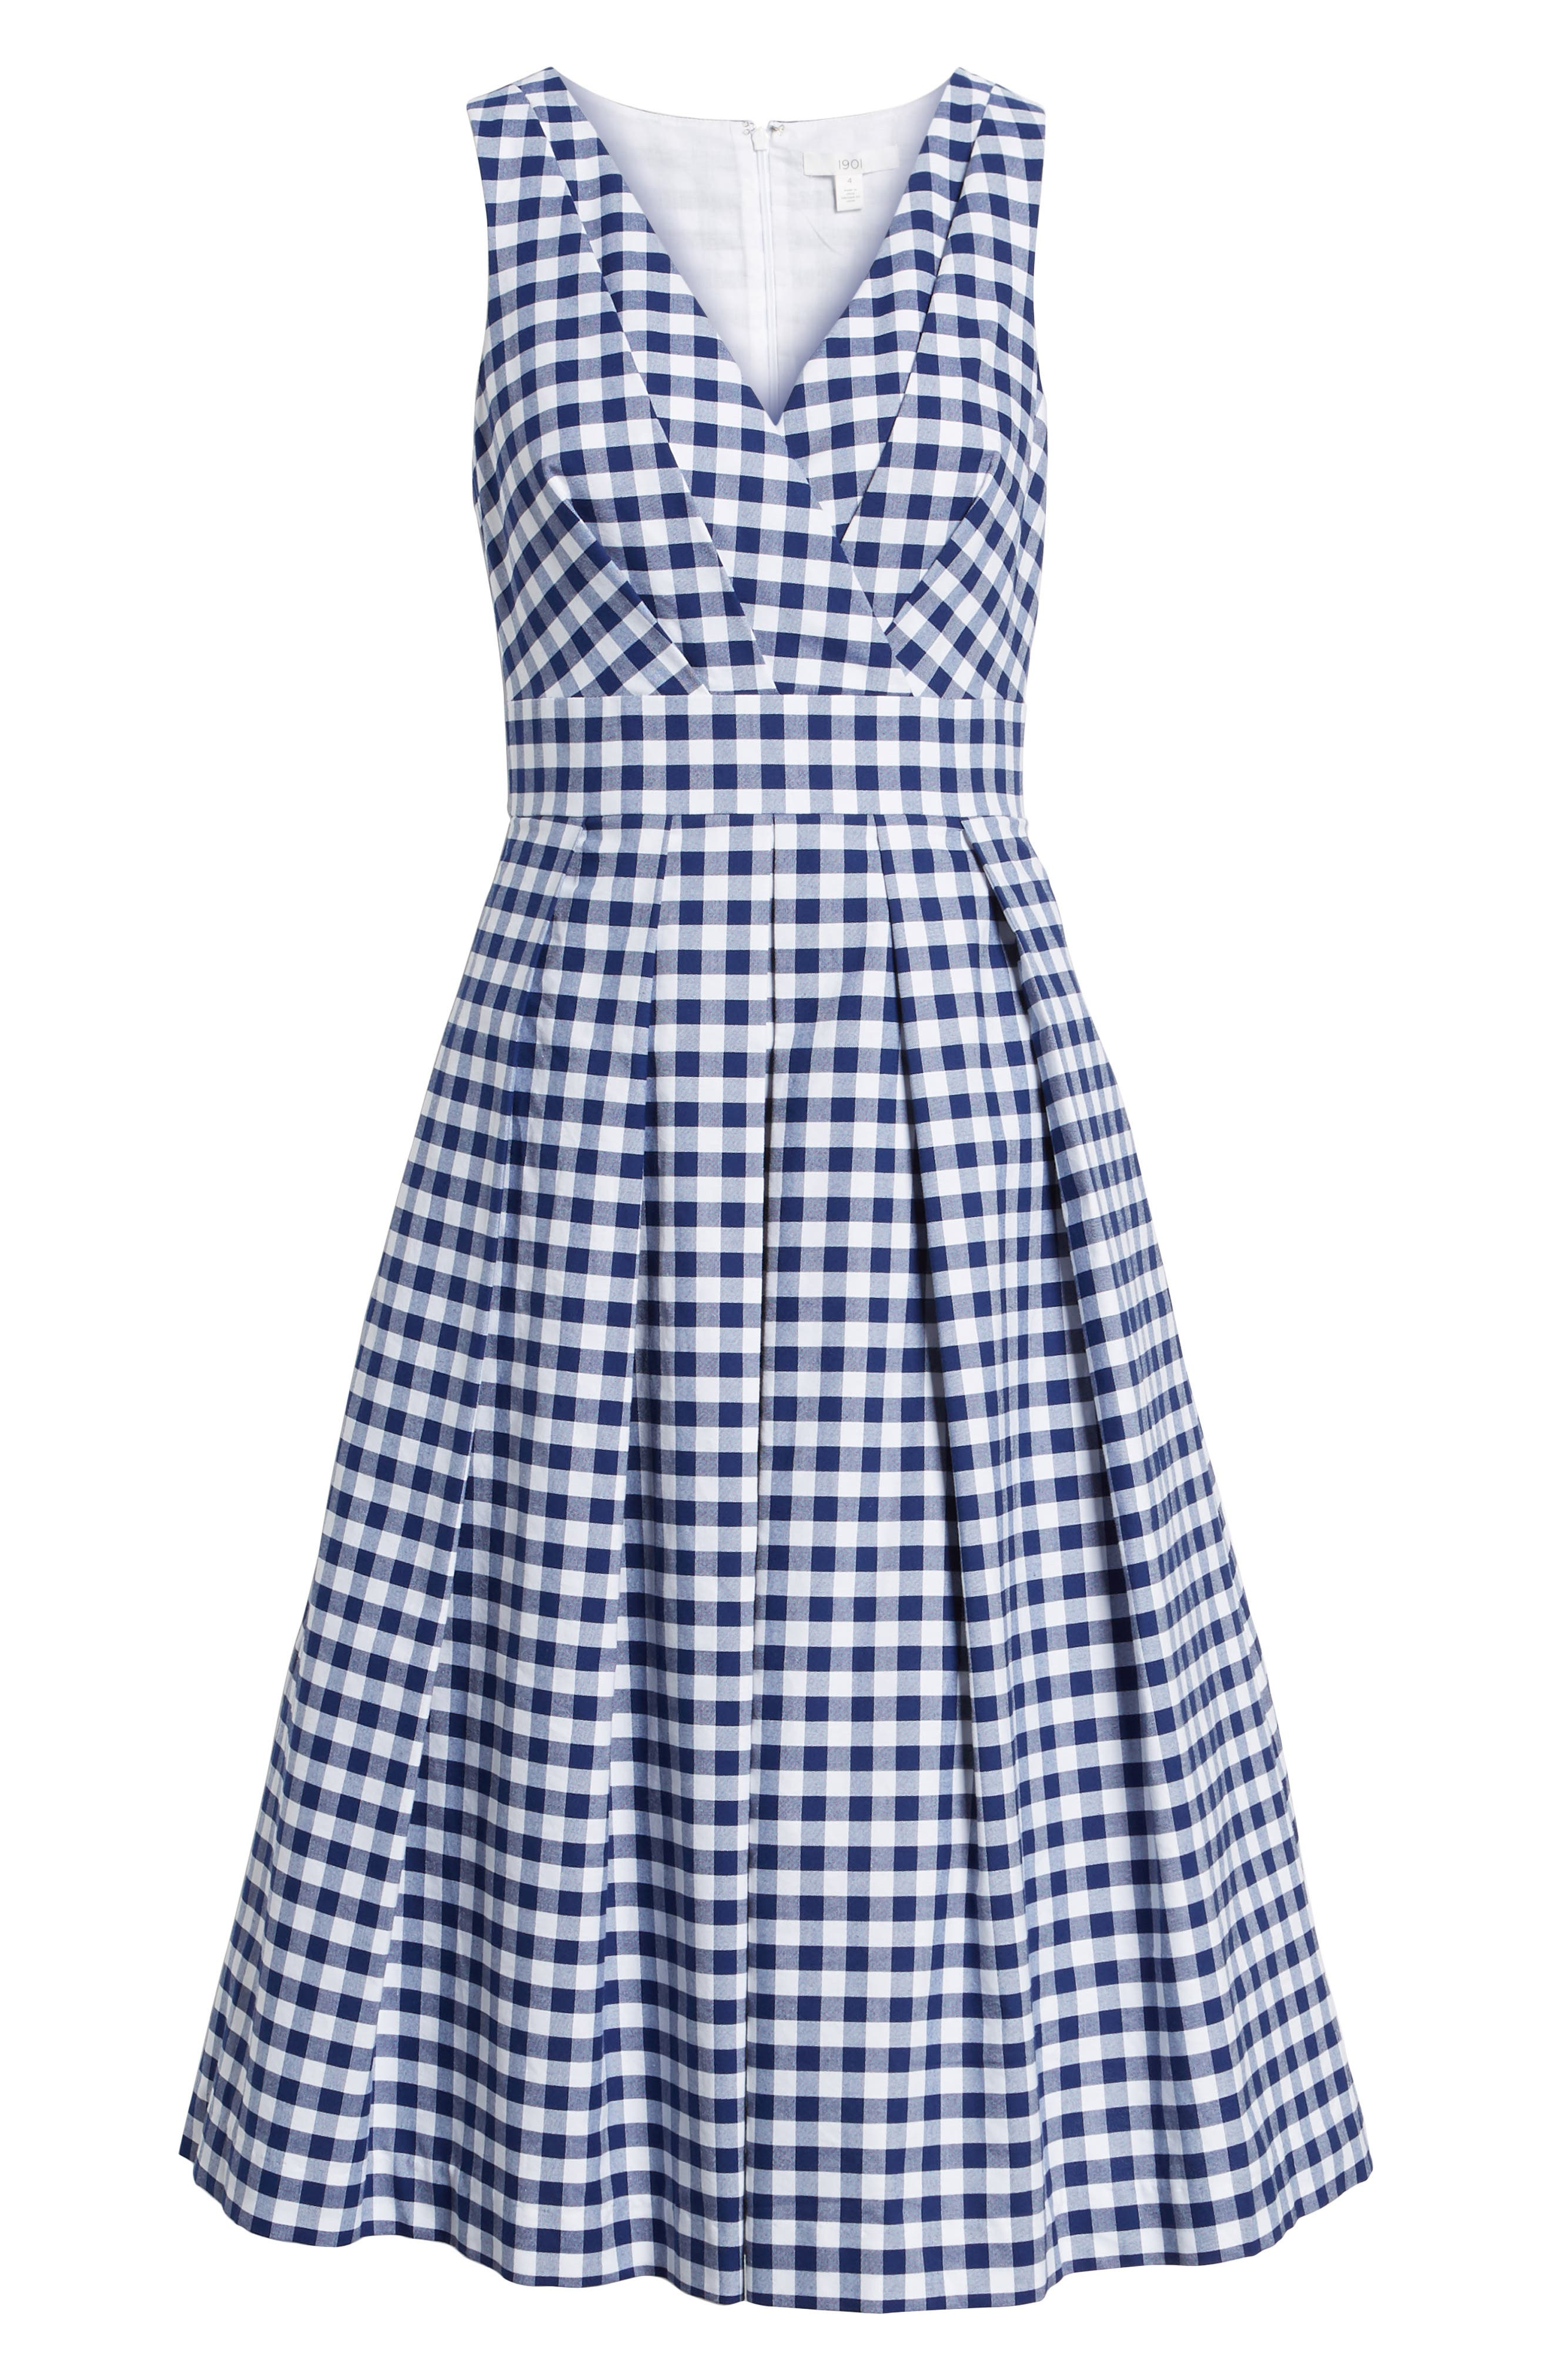 Gingham Fit & Flare Midi Dress,                             Alternate thumbnail 6, color,                             Navy Gingham